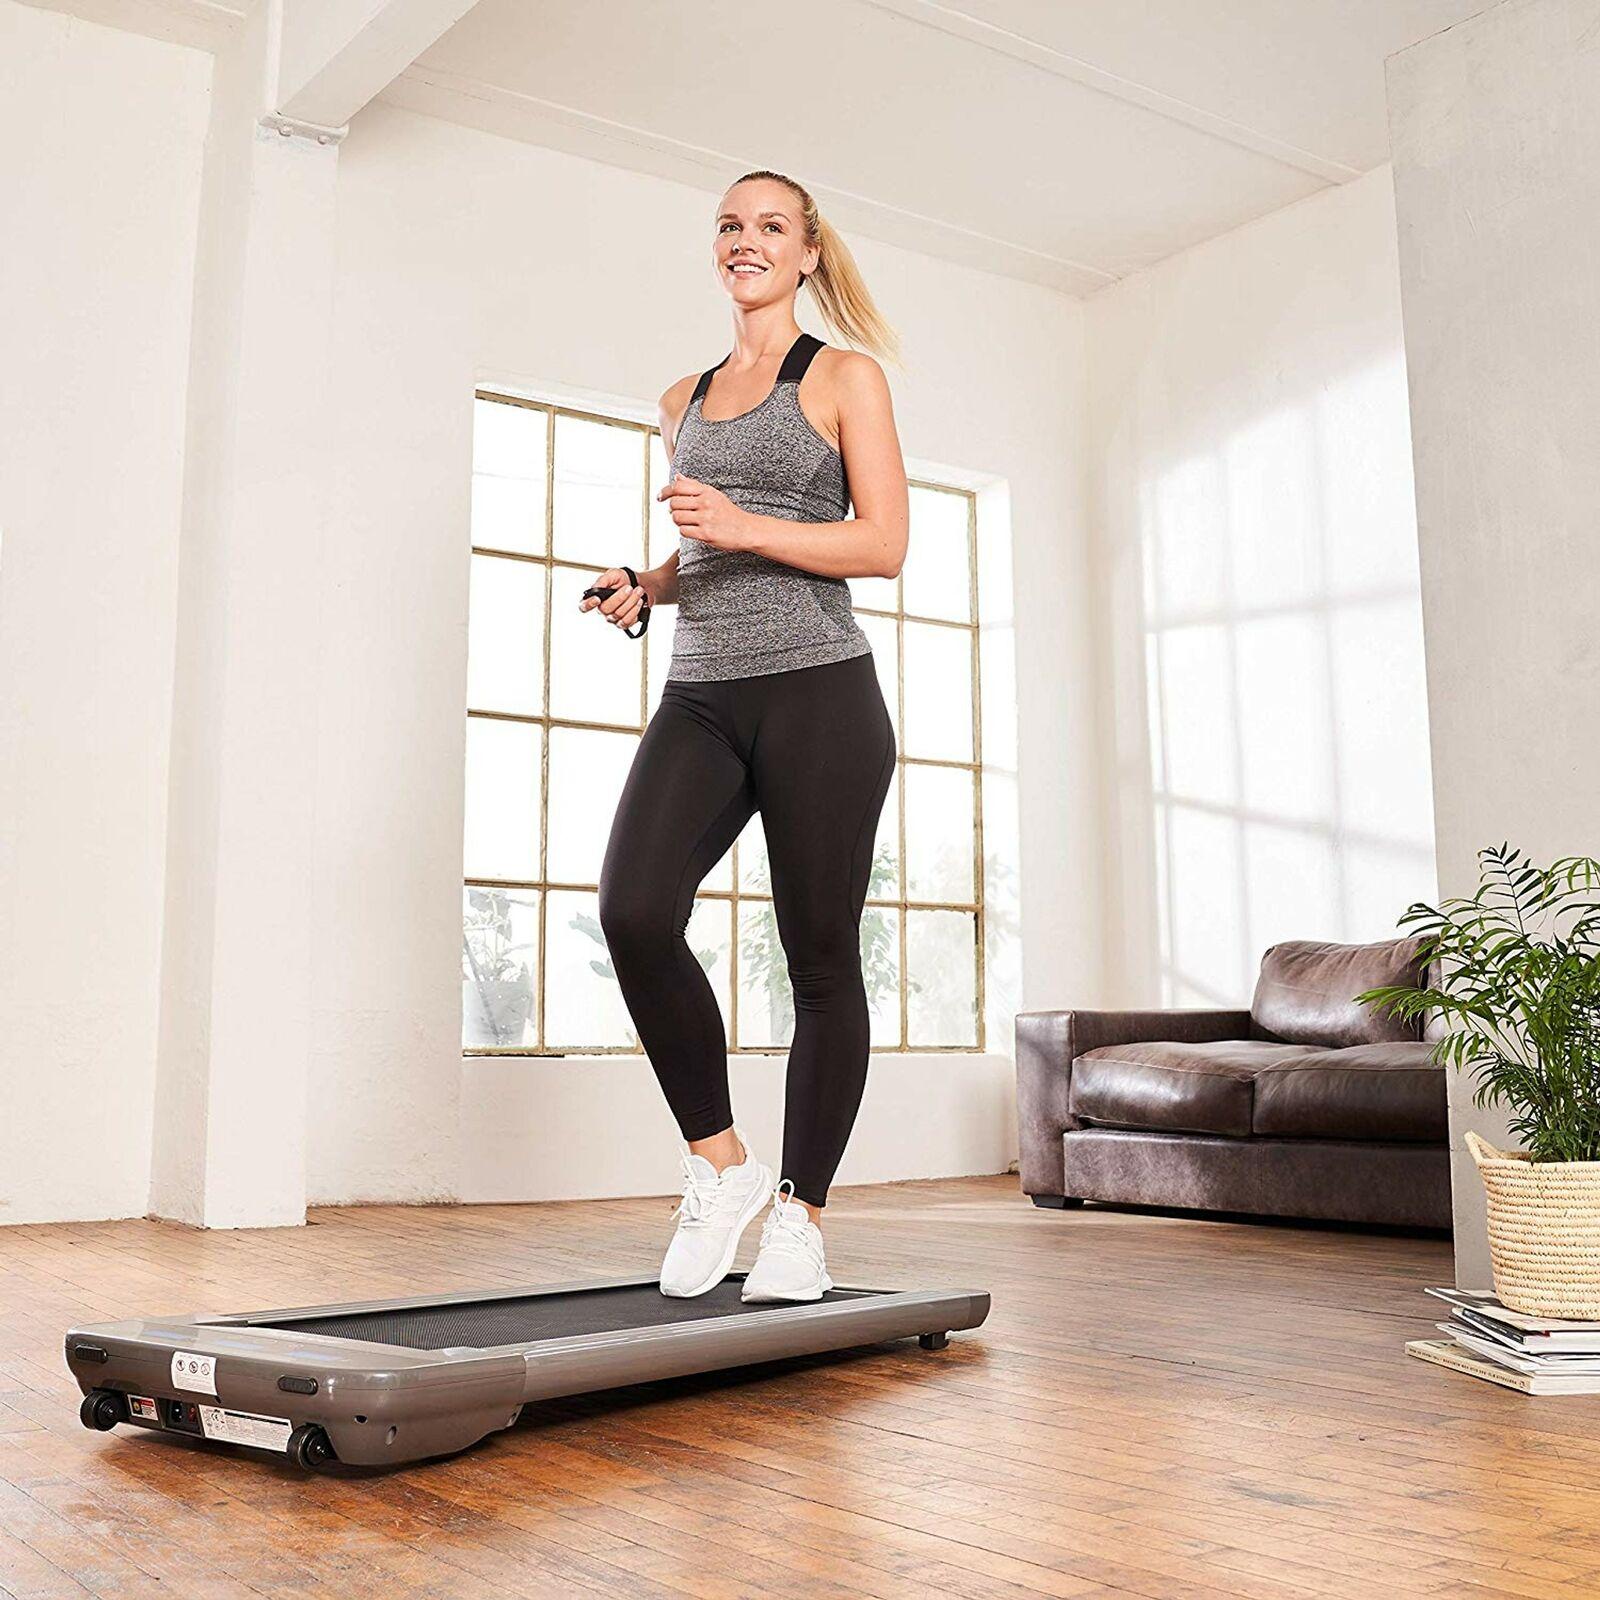 SportPlus Laufband WalkingPad Treadmill Heimtrainer Geh-/ Lauftraining 0,8-6km/h